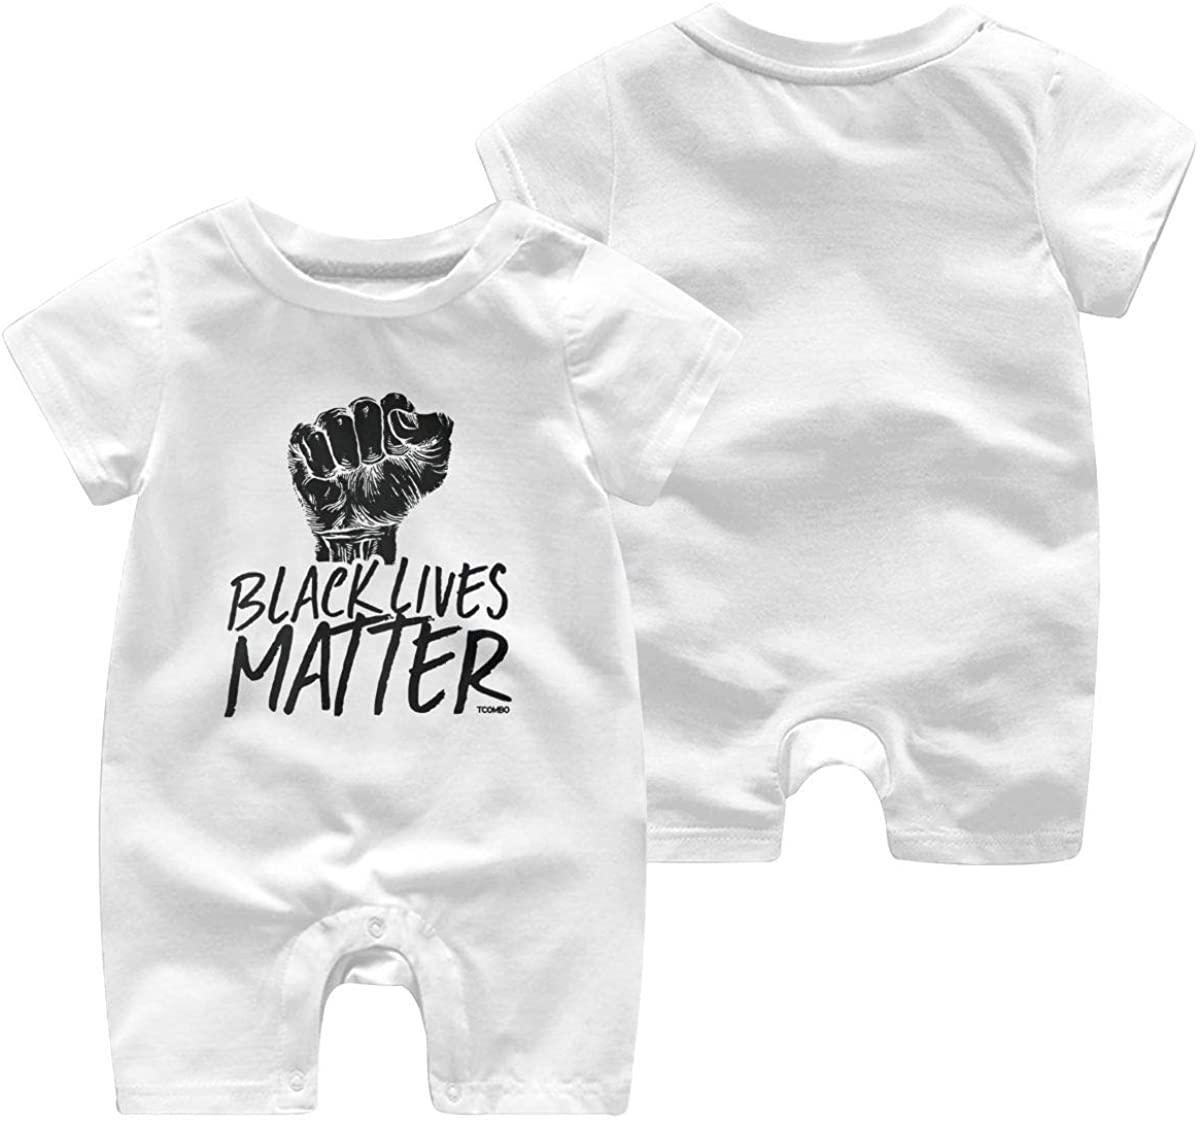 Black Lives Matter - Revolution Movement Baby Jumpsuit Infant Short Sleeve Kids Cotton Bodysuit